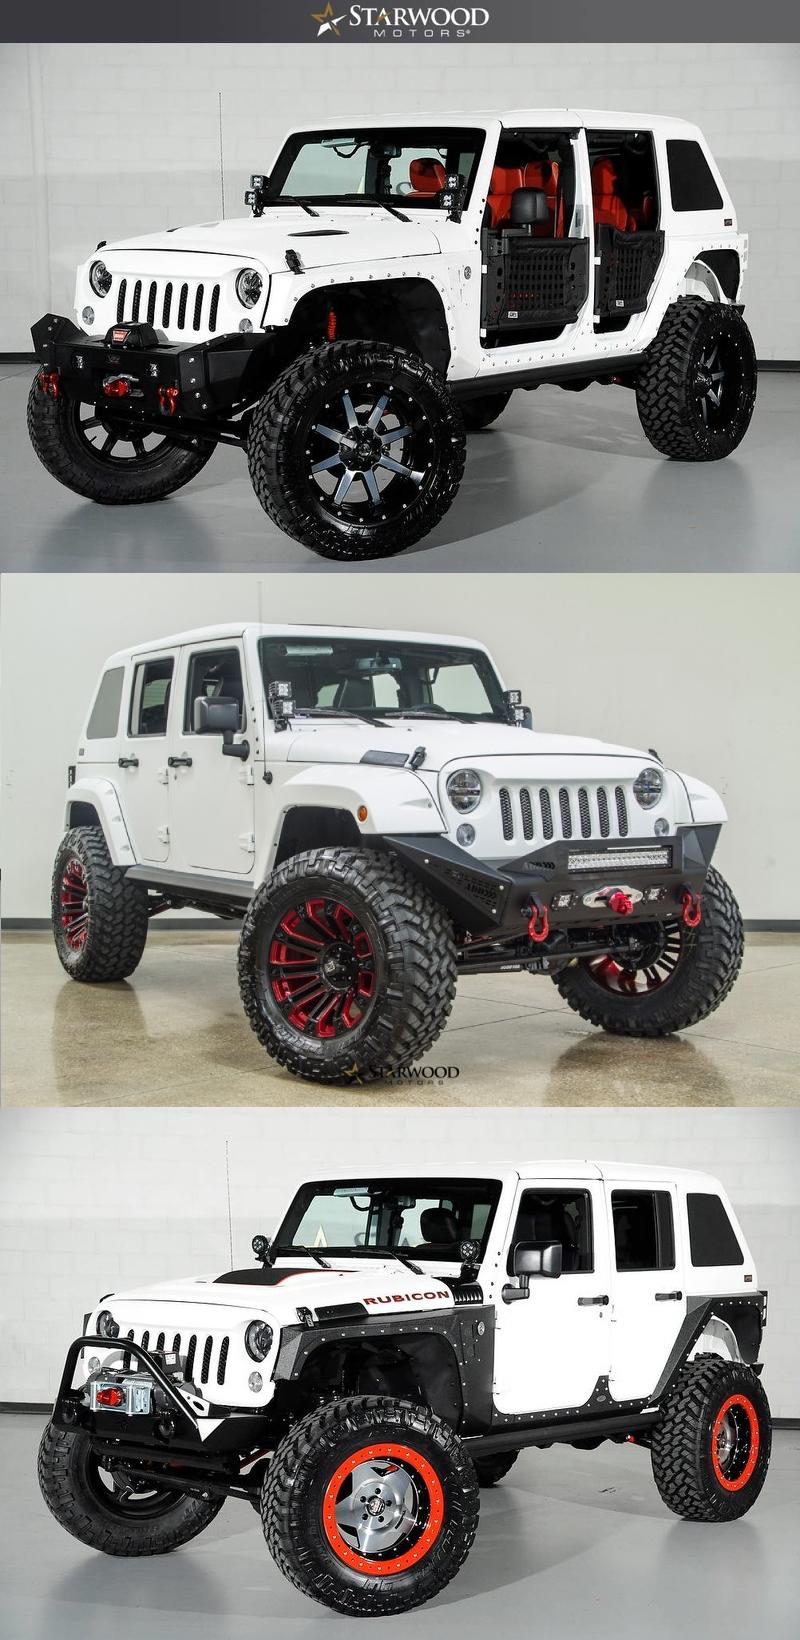 Custom Project Jeep Vehicles Starwood Motors Red Jeep Wrangler White Jeep Wrangler Unlimited White Jeep Wrangler